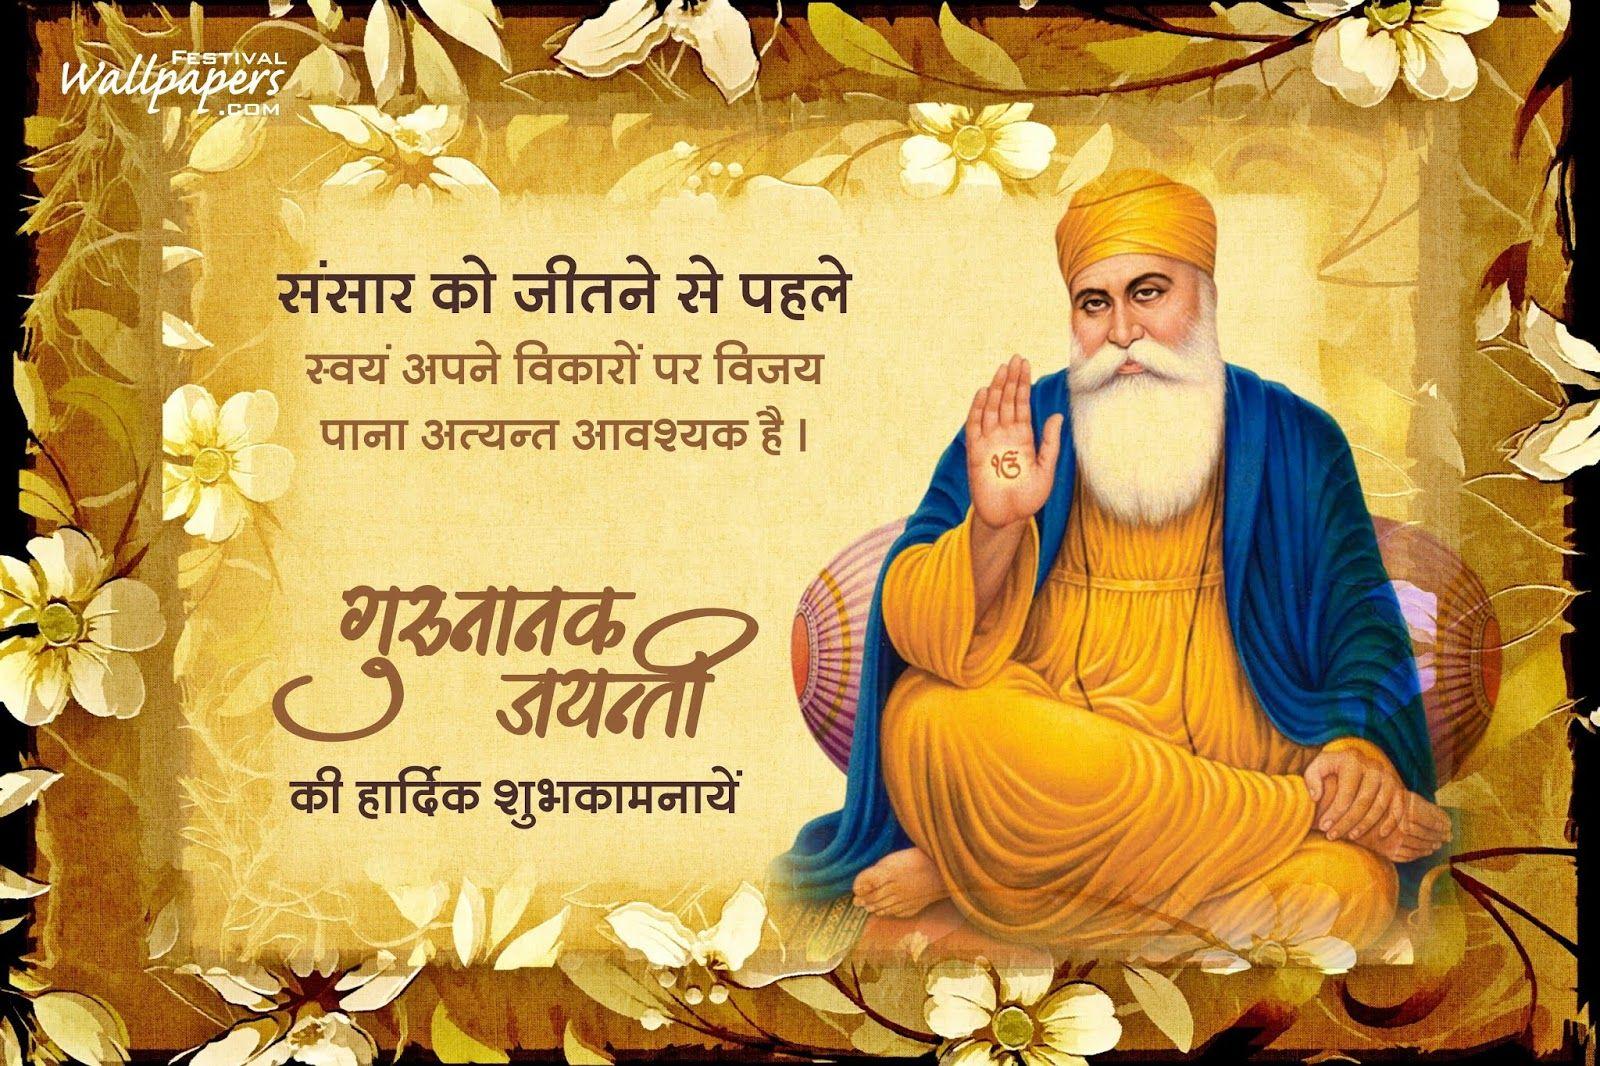 Guru Nanak Birthday 2022